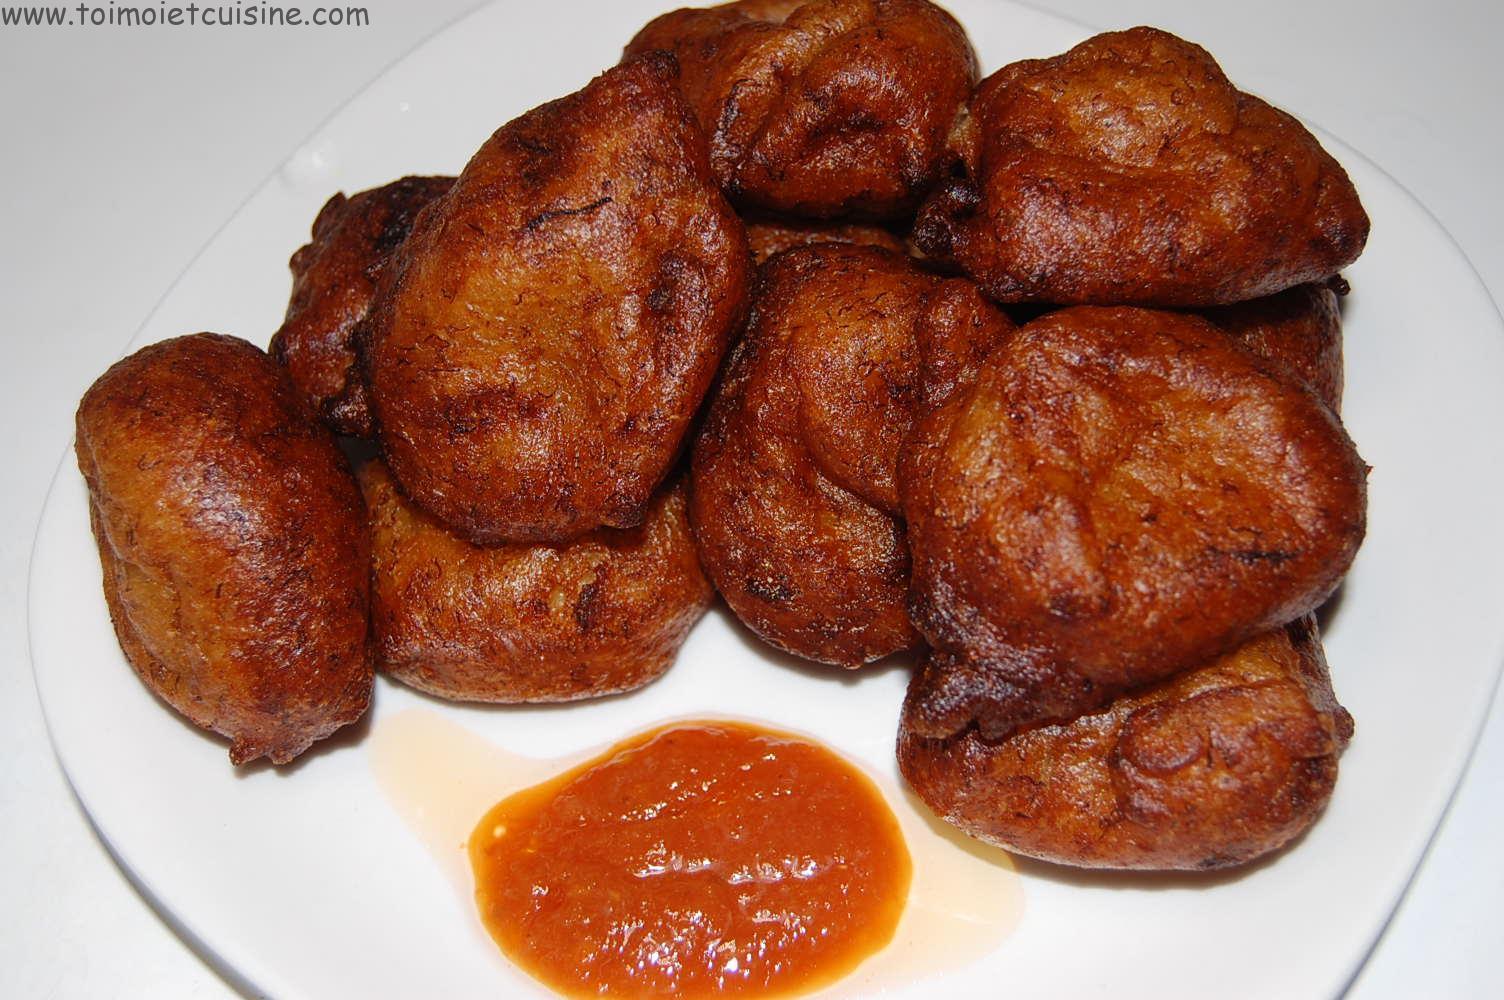 Beignet de banane toi moi cuisine - Recette de cuisine camerounaise ...